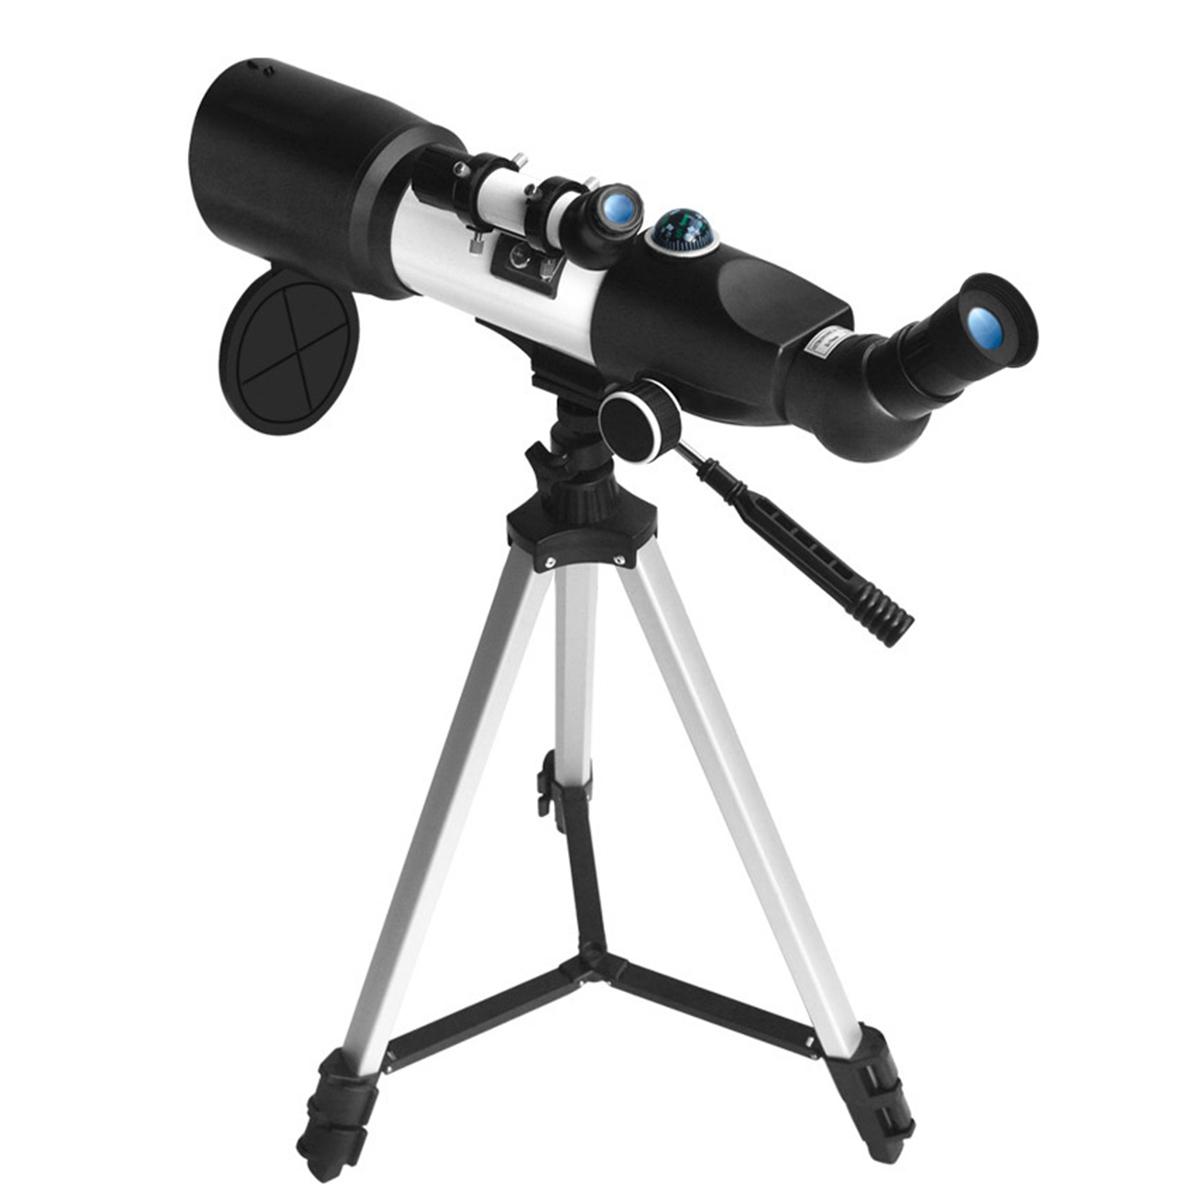 Professional 14X-117X Astronomical Telescope 350m Focal Length 360 Rotation Monocular Students Children's Scientific Experiment